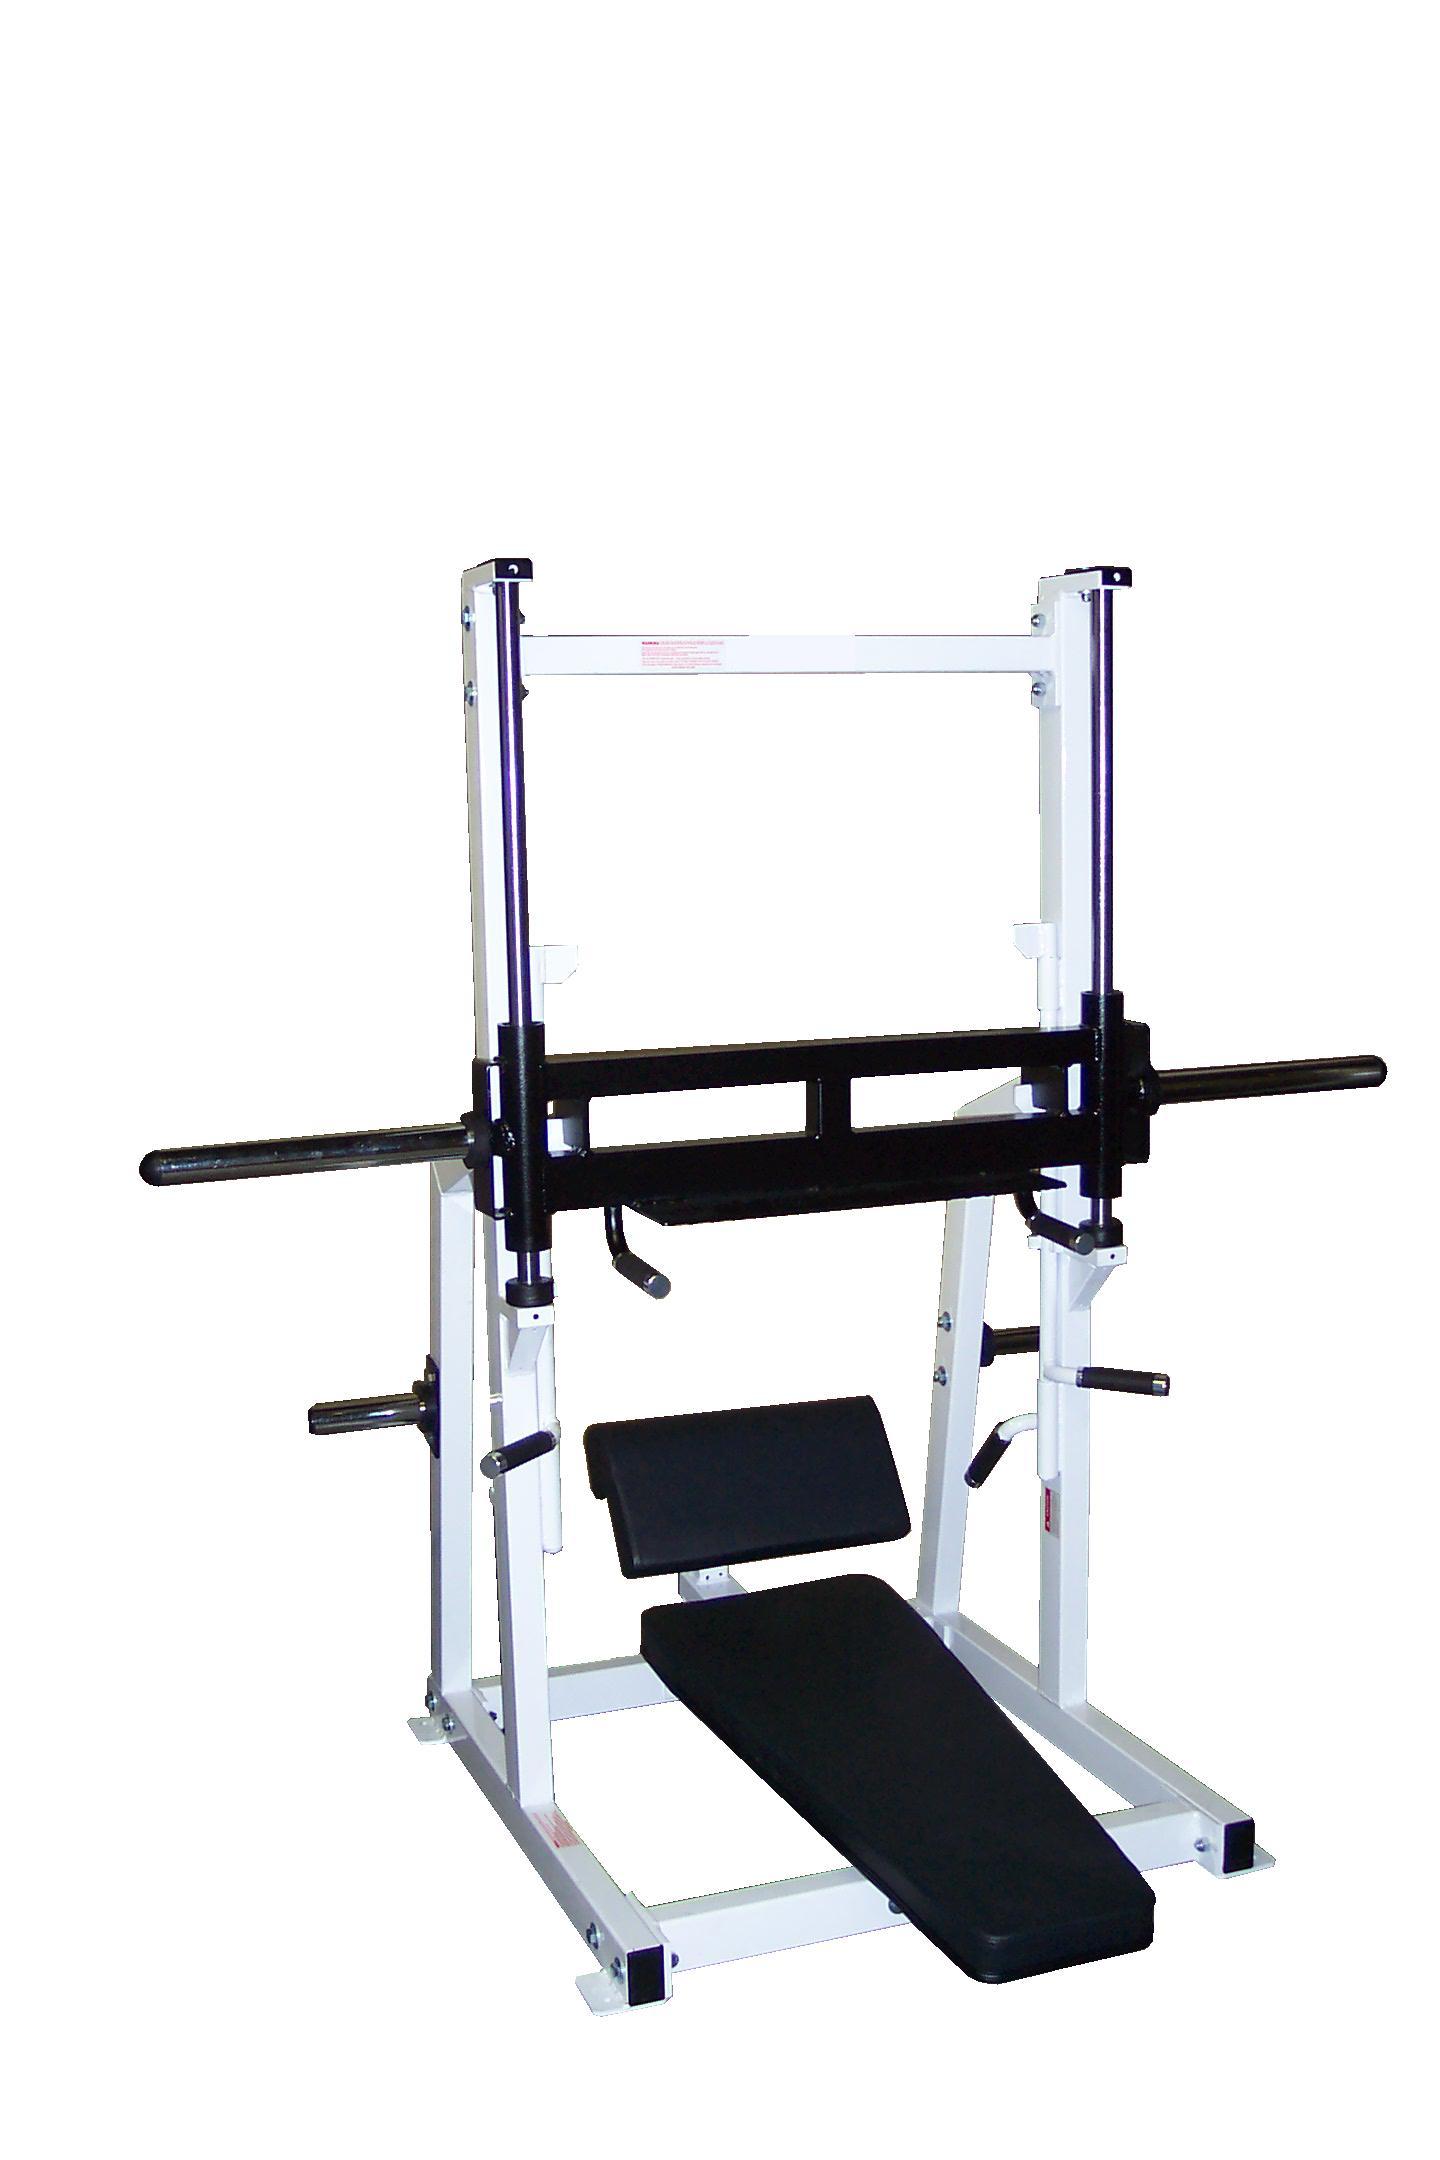 MAX#CVLP1 Vertical Leg Press